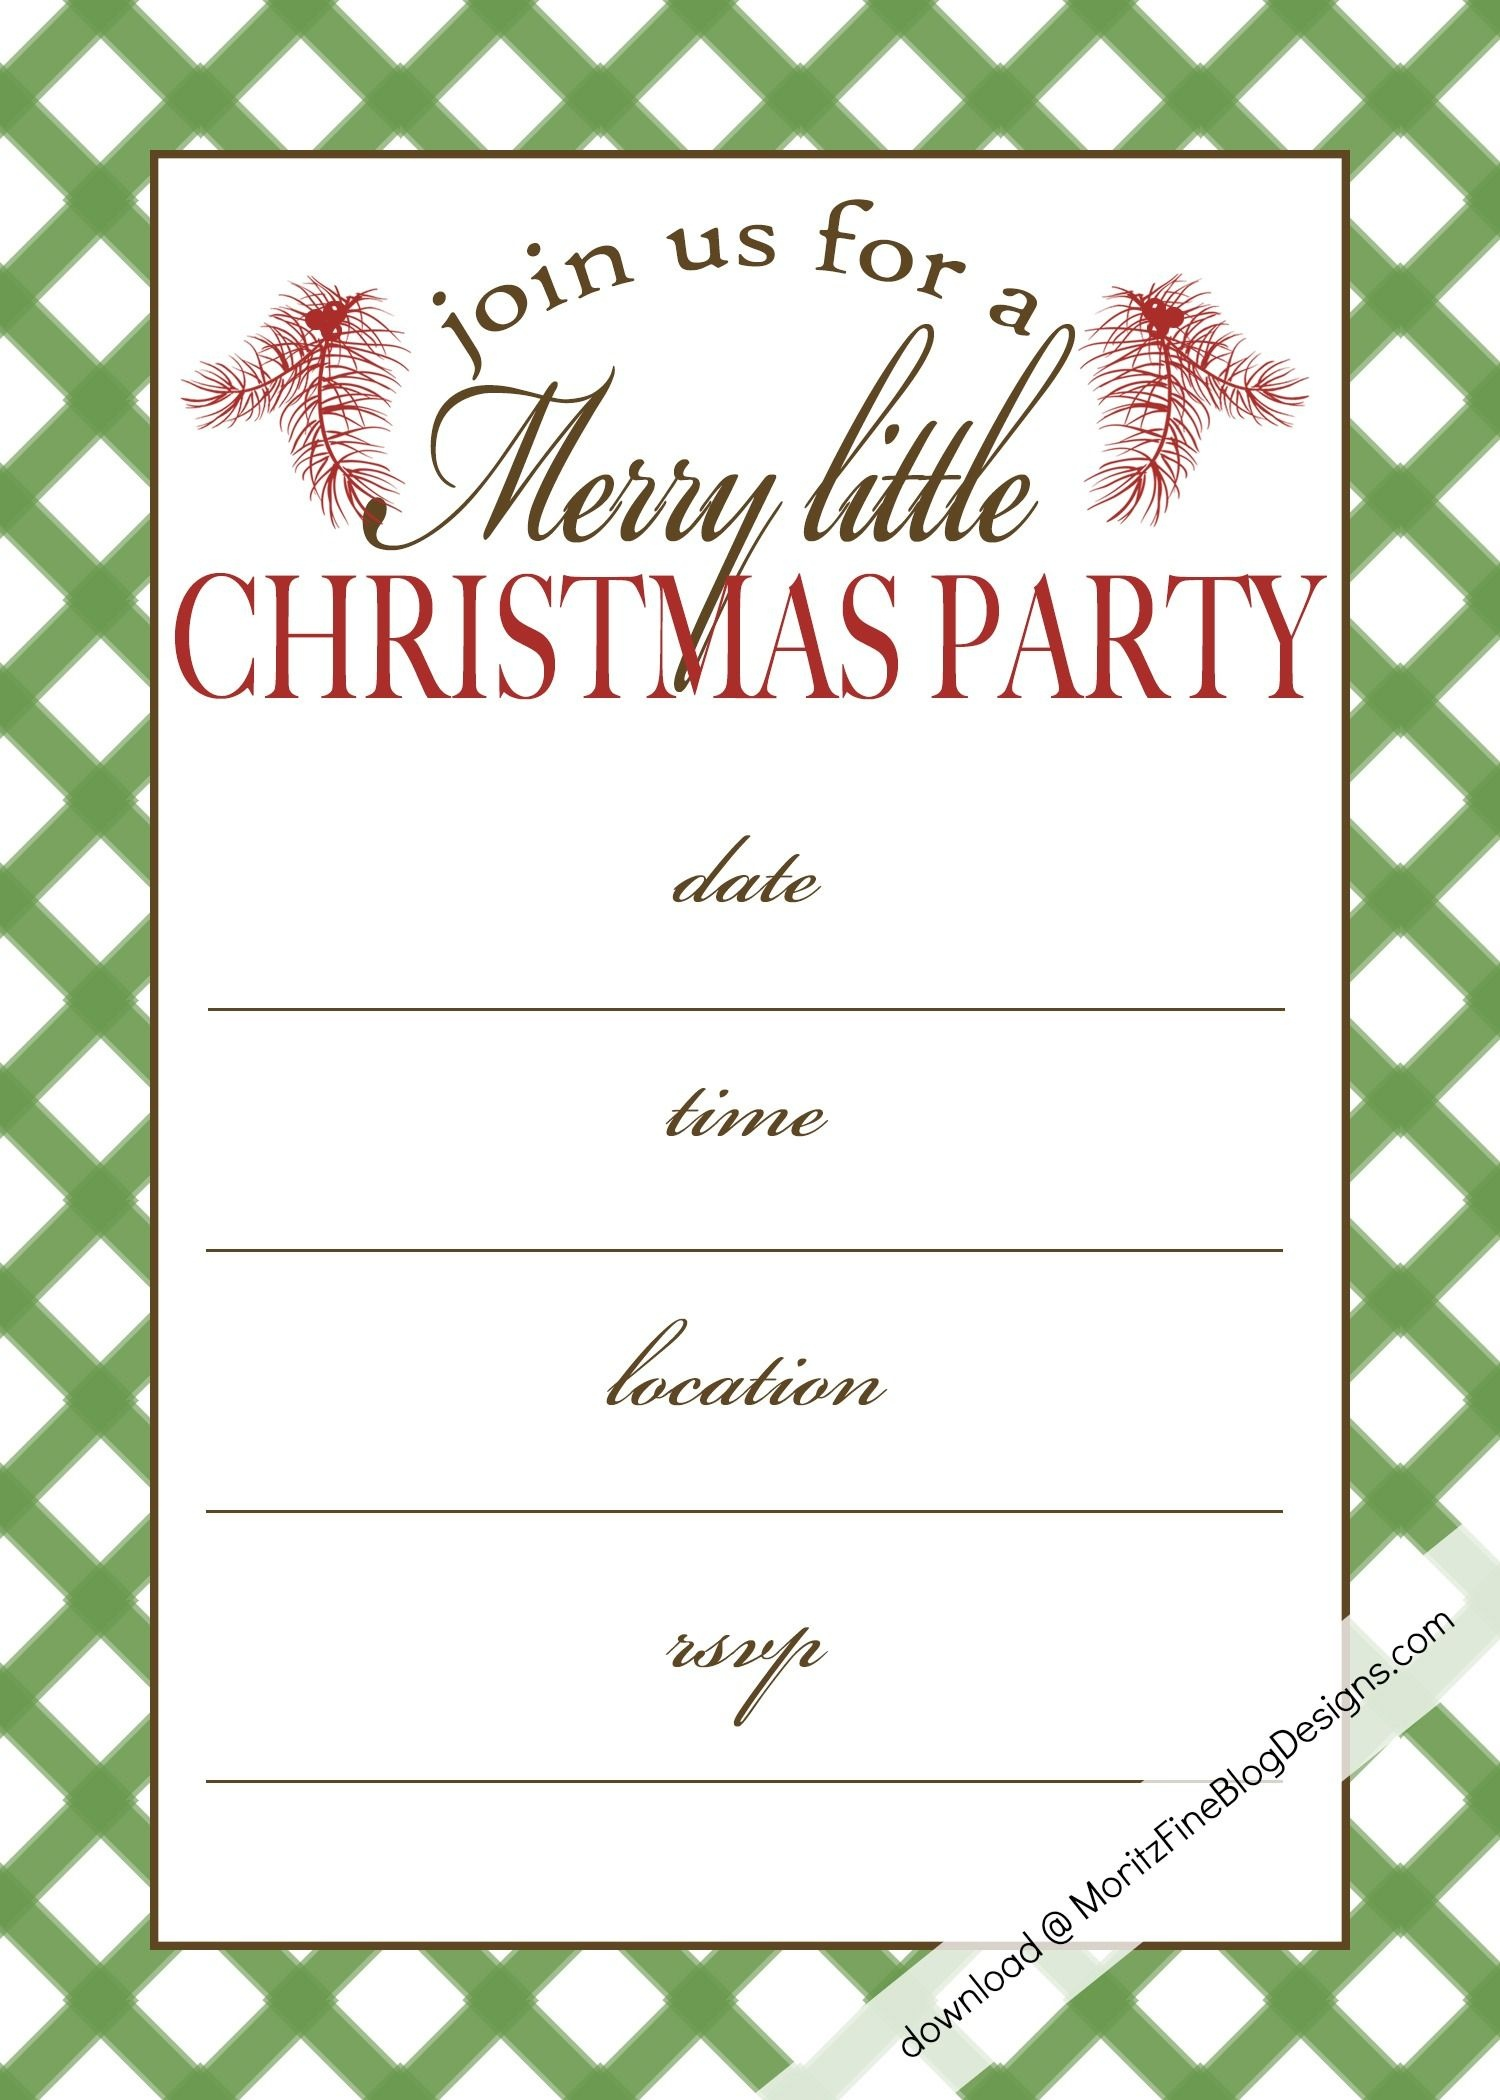 Free Printable Christmas Party Invitation | Christmas:print - Free Online Printable Christmas Party Invitations